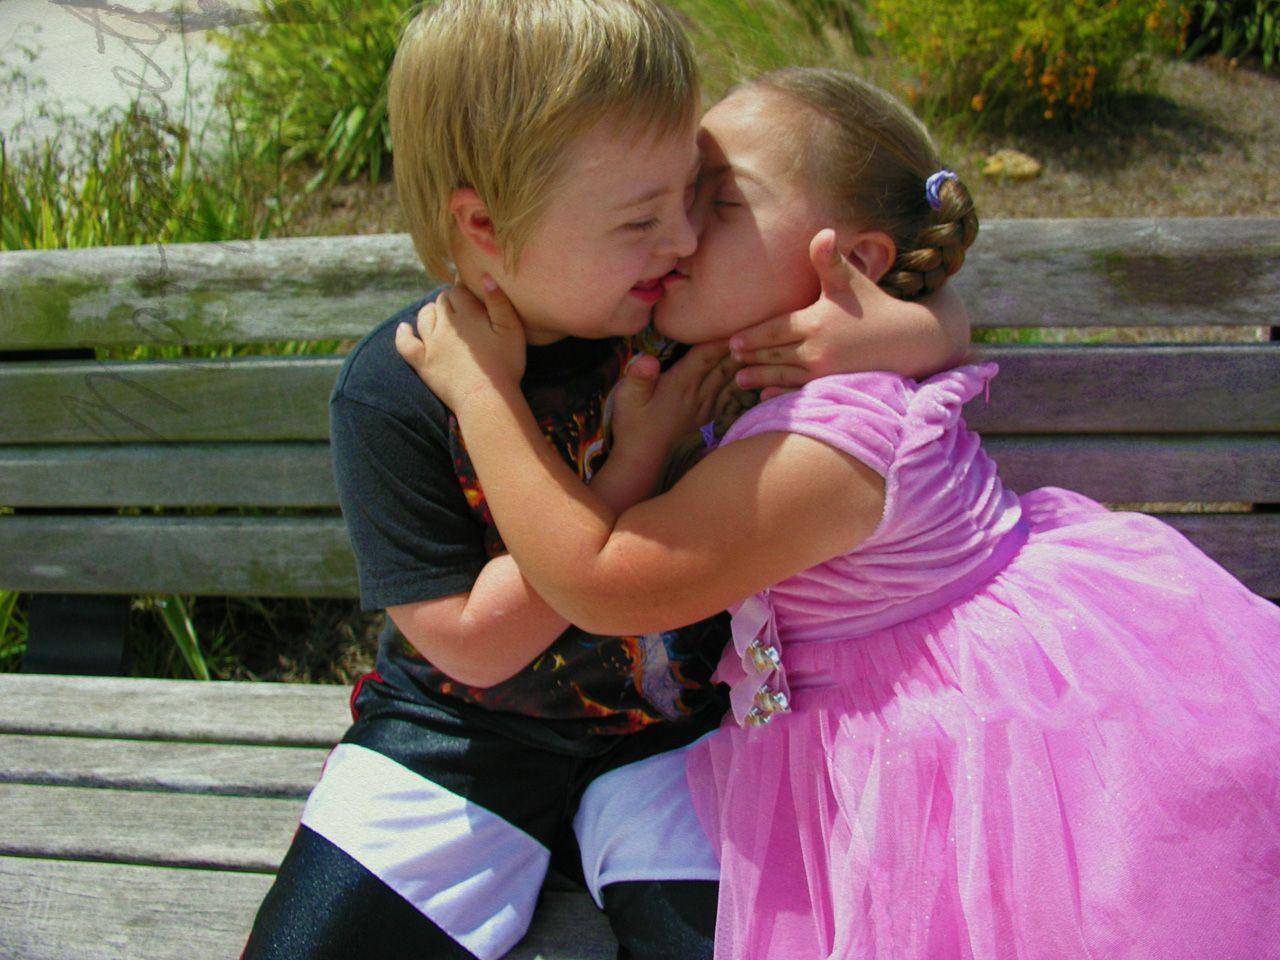 Hd wallpaper kiss - Wallpaper Mwah Pretty Little Kisses